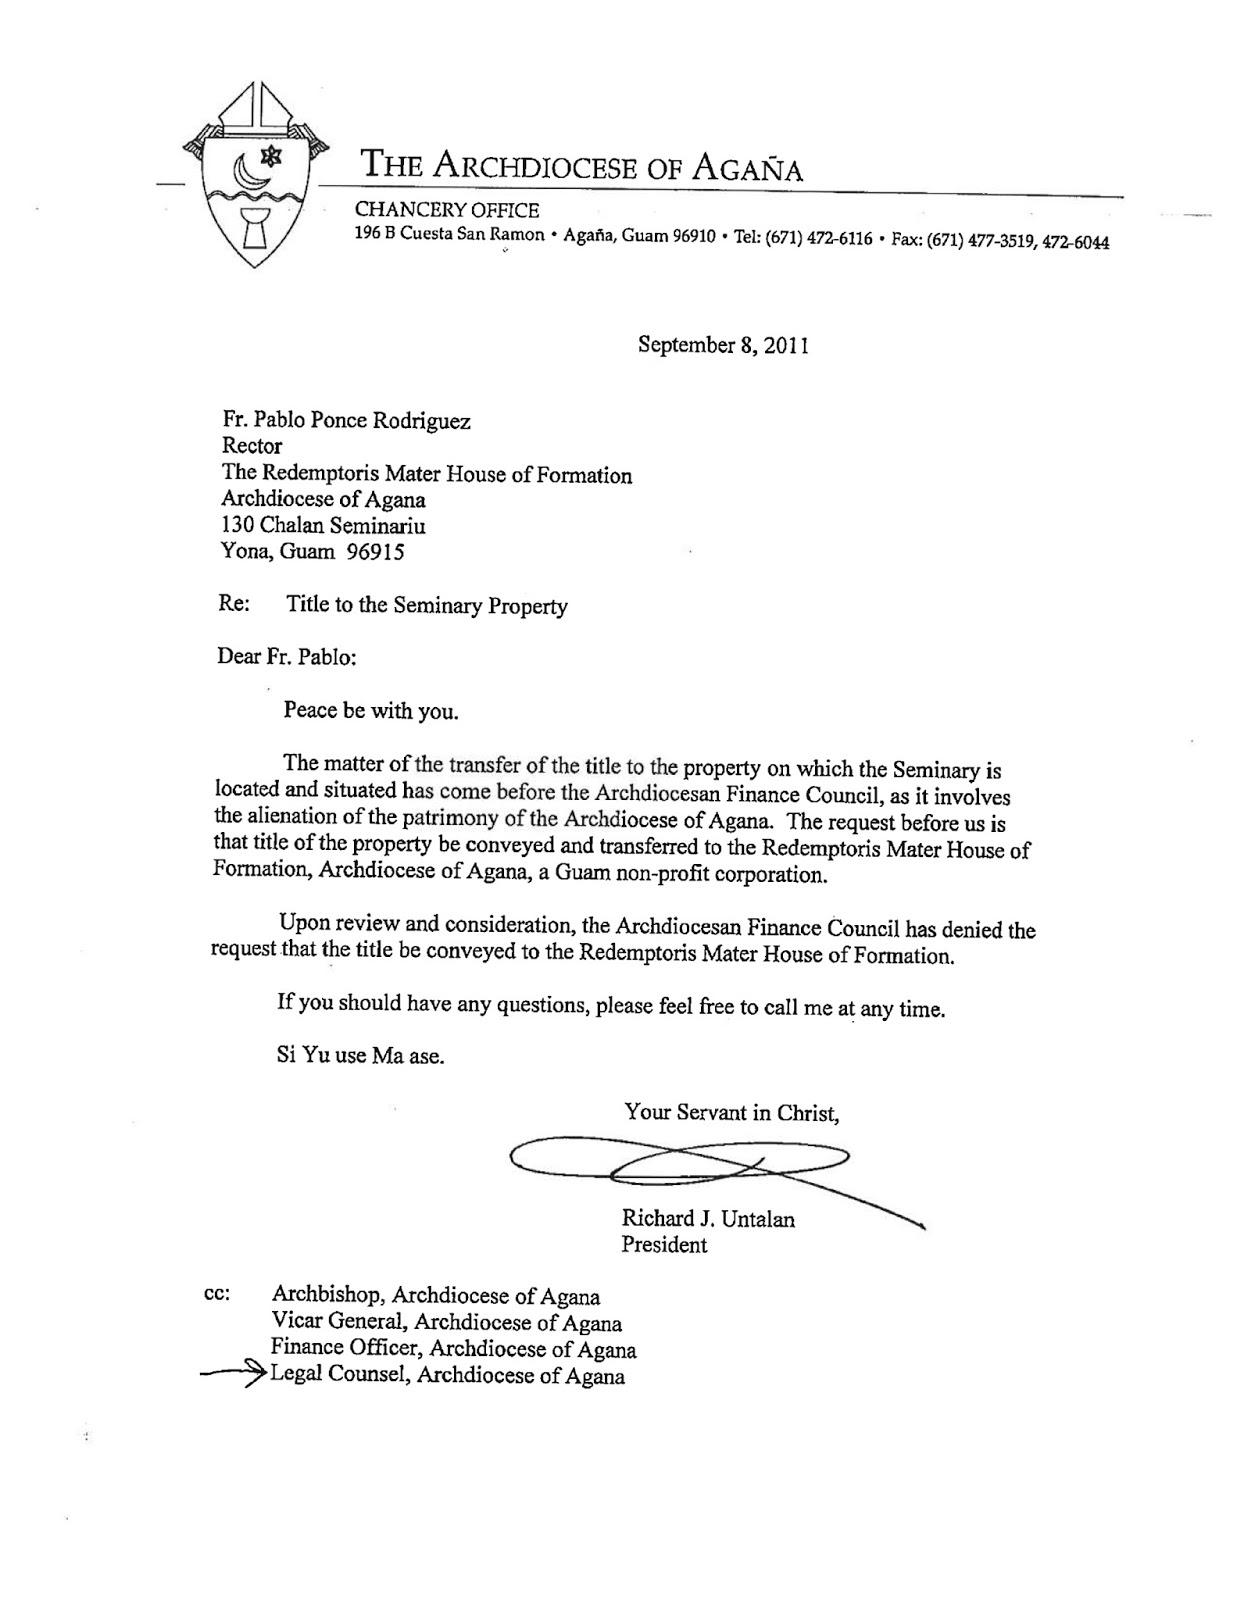 Request approval open university essay